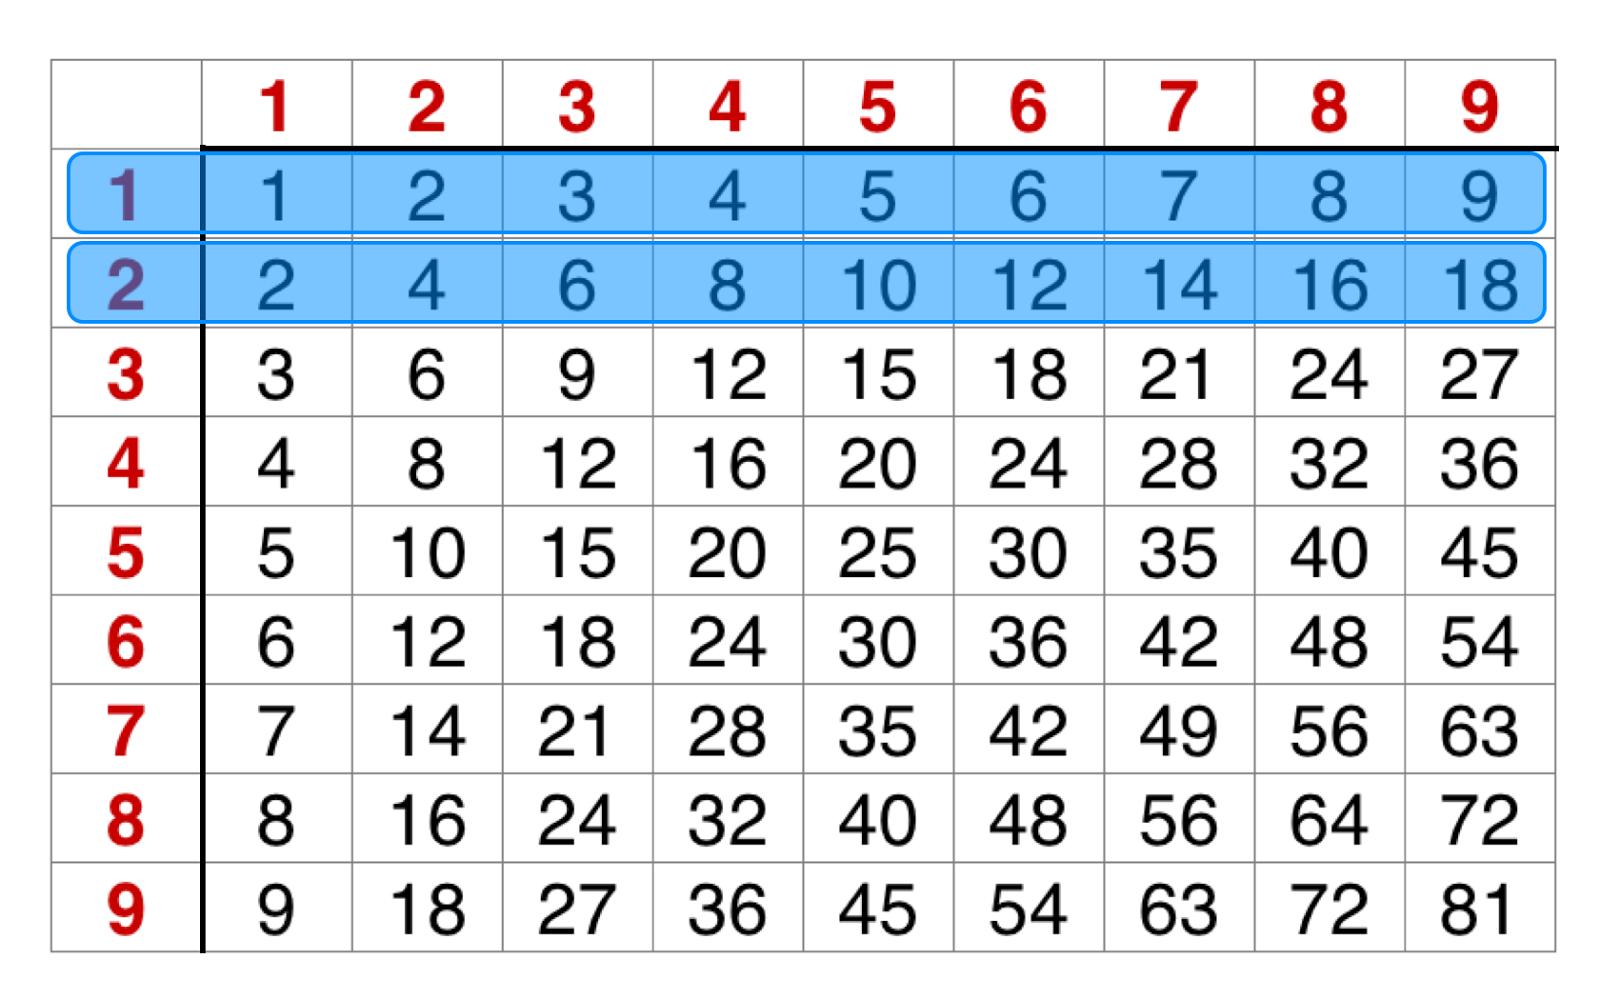 Equivalent Fraction 12 16